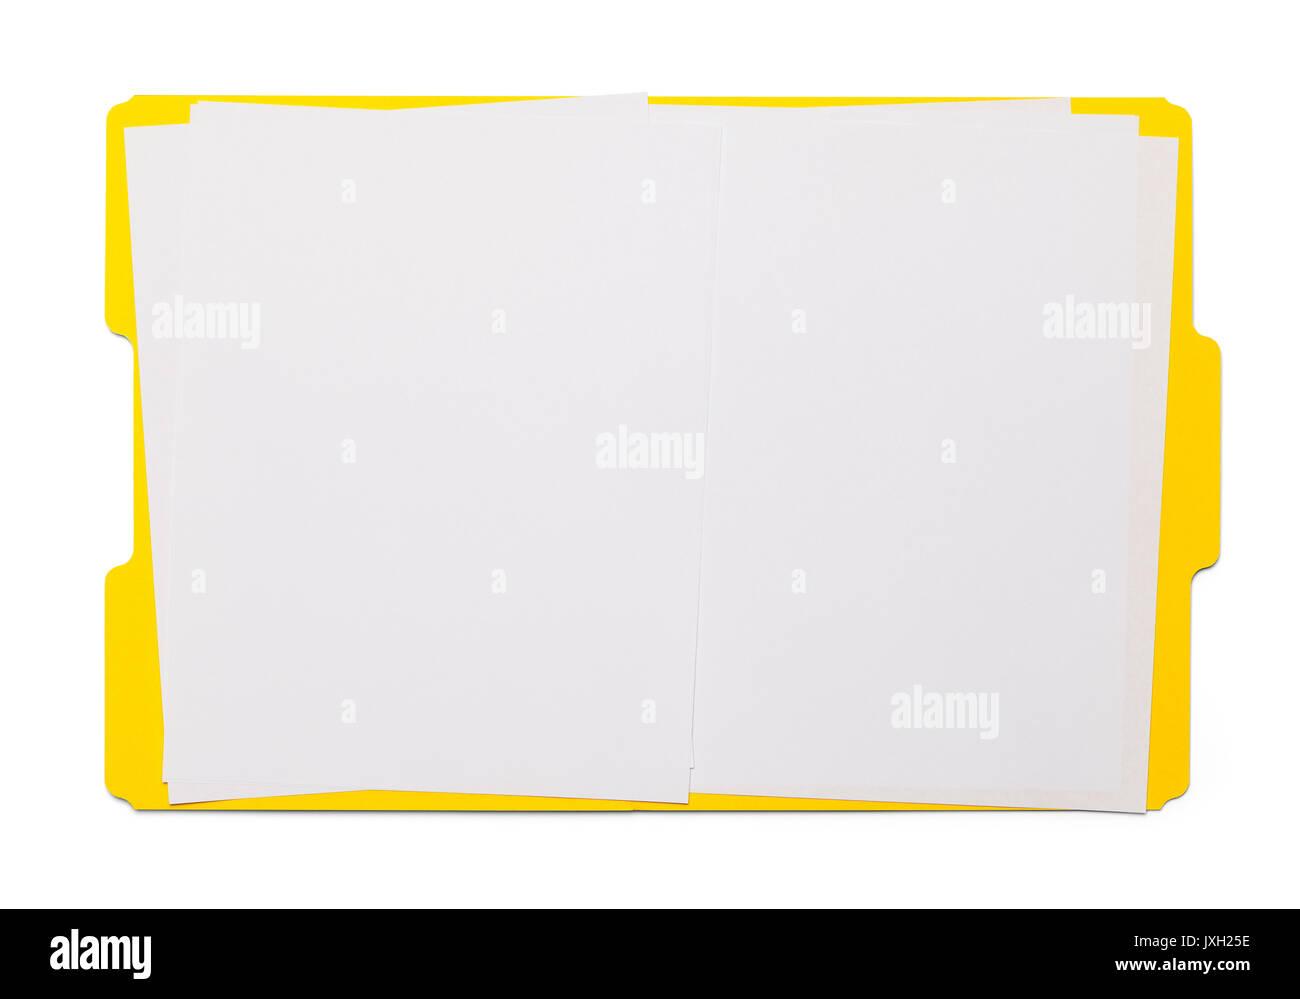 Open Yellow Folder Isolated on White Background. - Stock Image